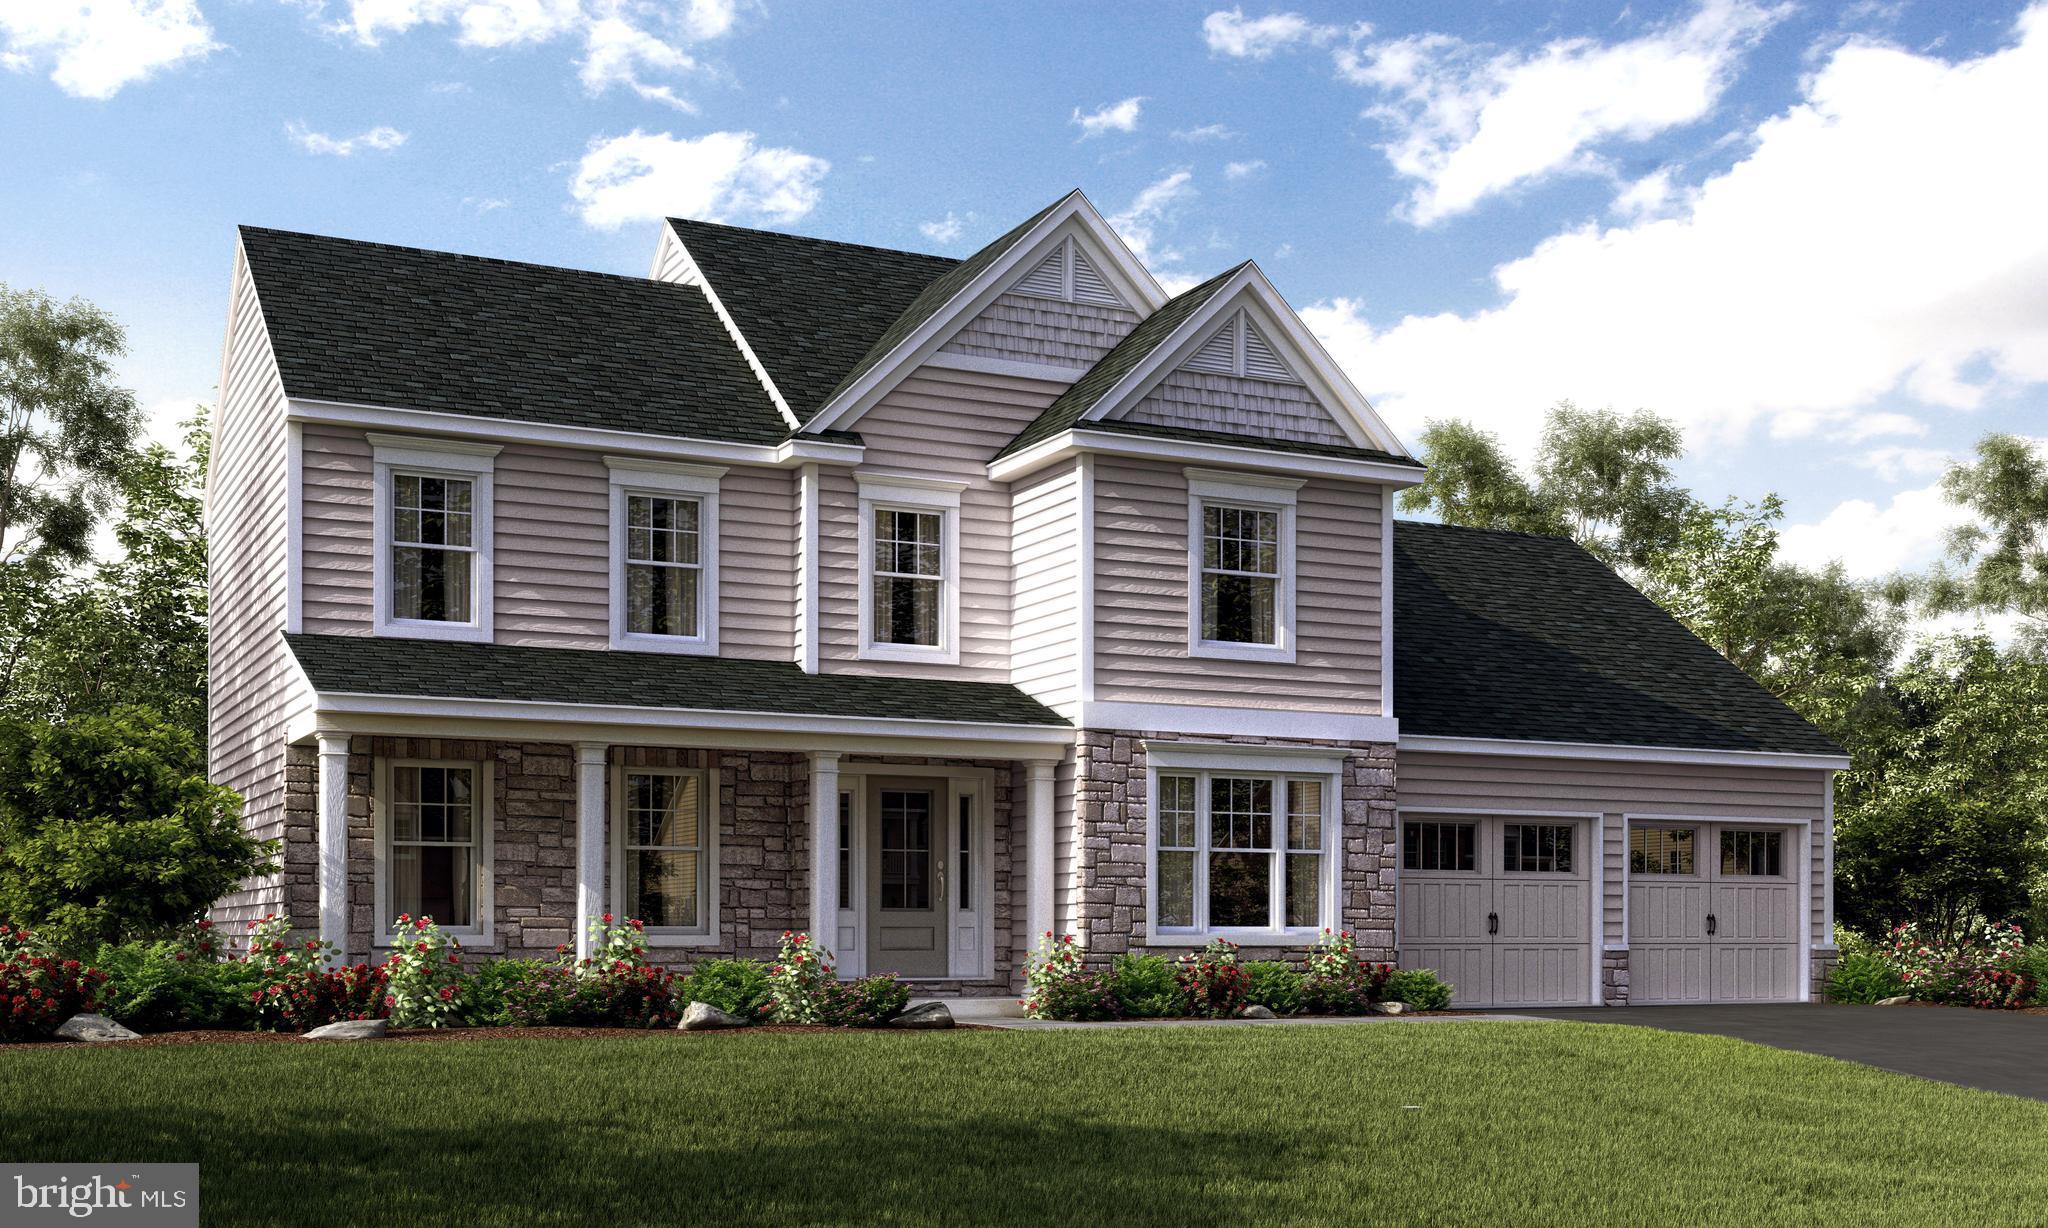 1559 Wheatfield Vista, Landisville, PA 17538